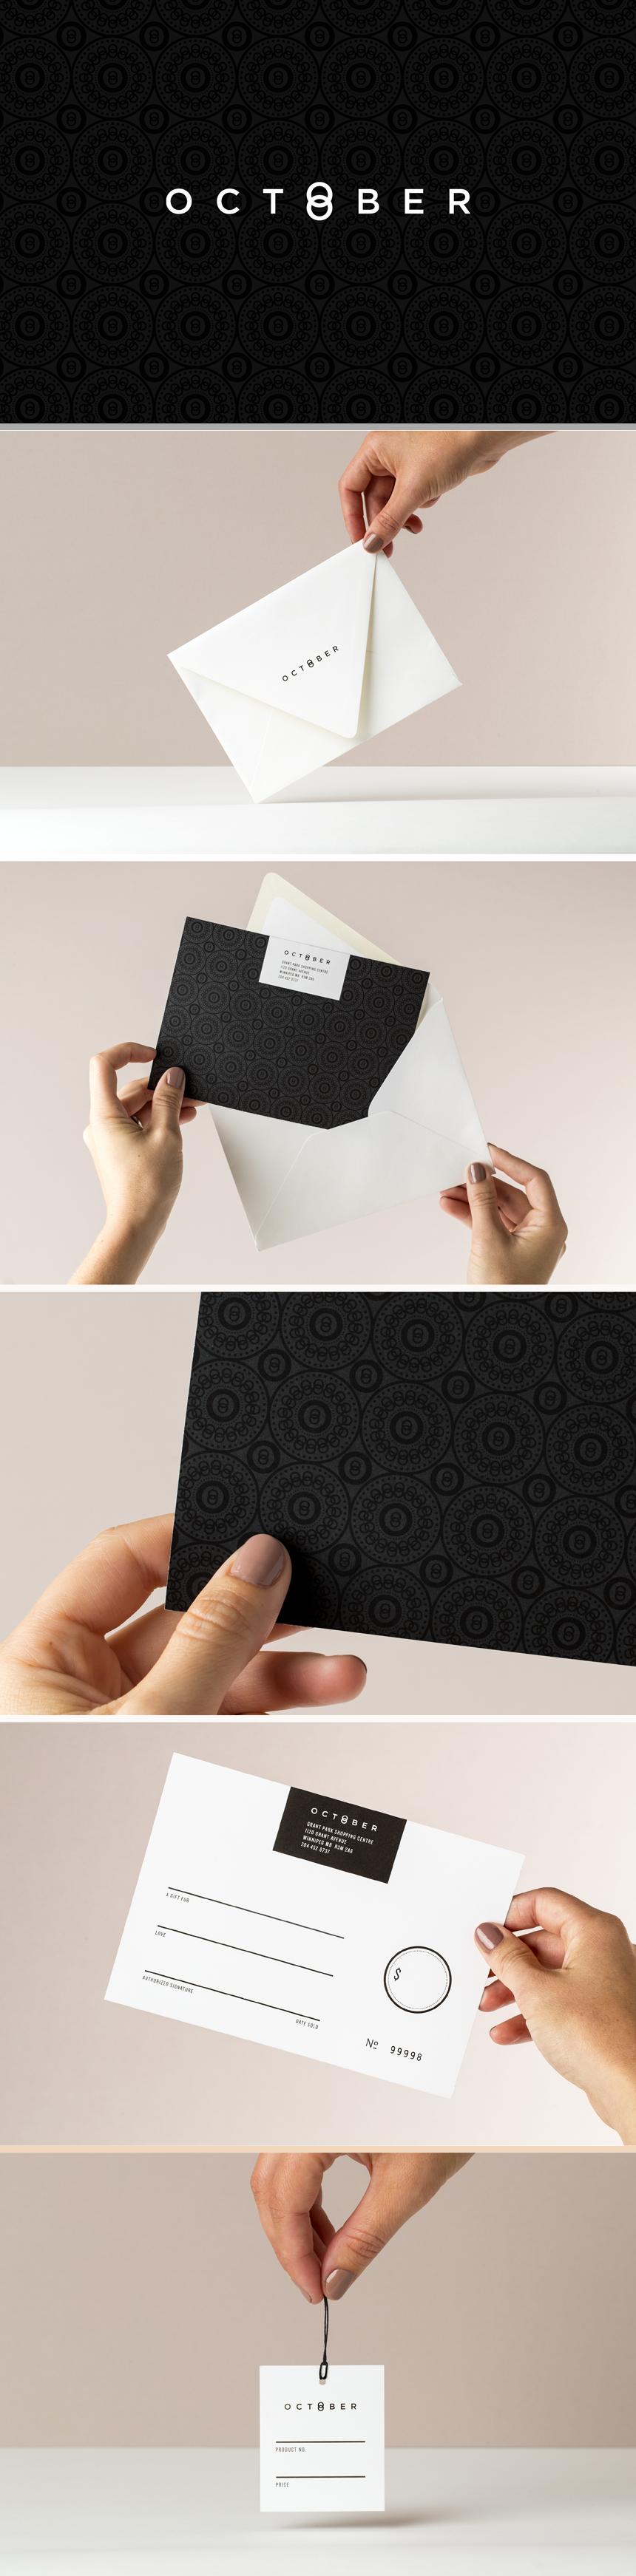 October Boutique - One Plus One Design